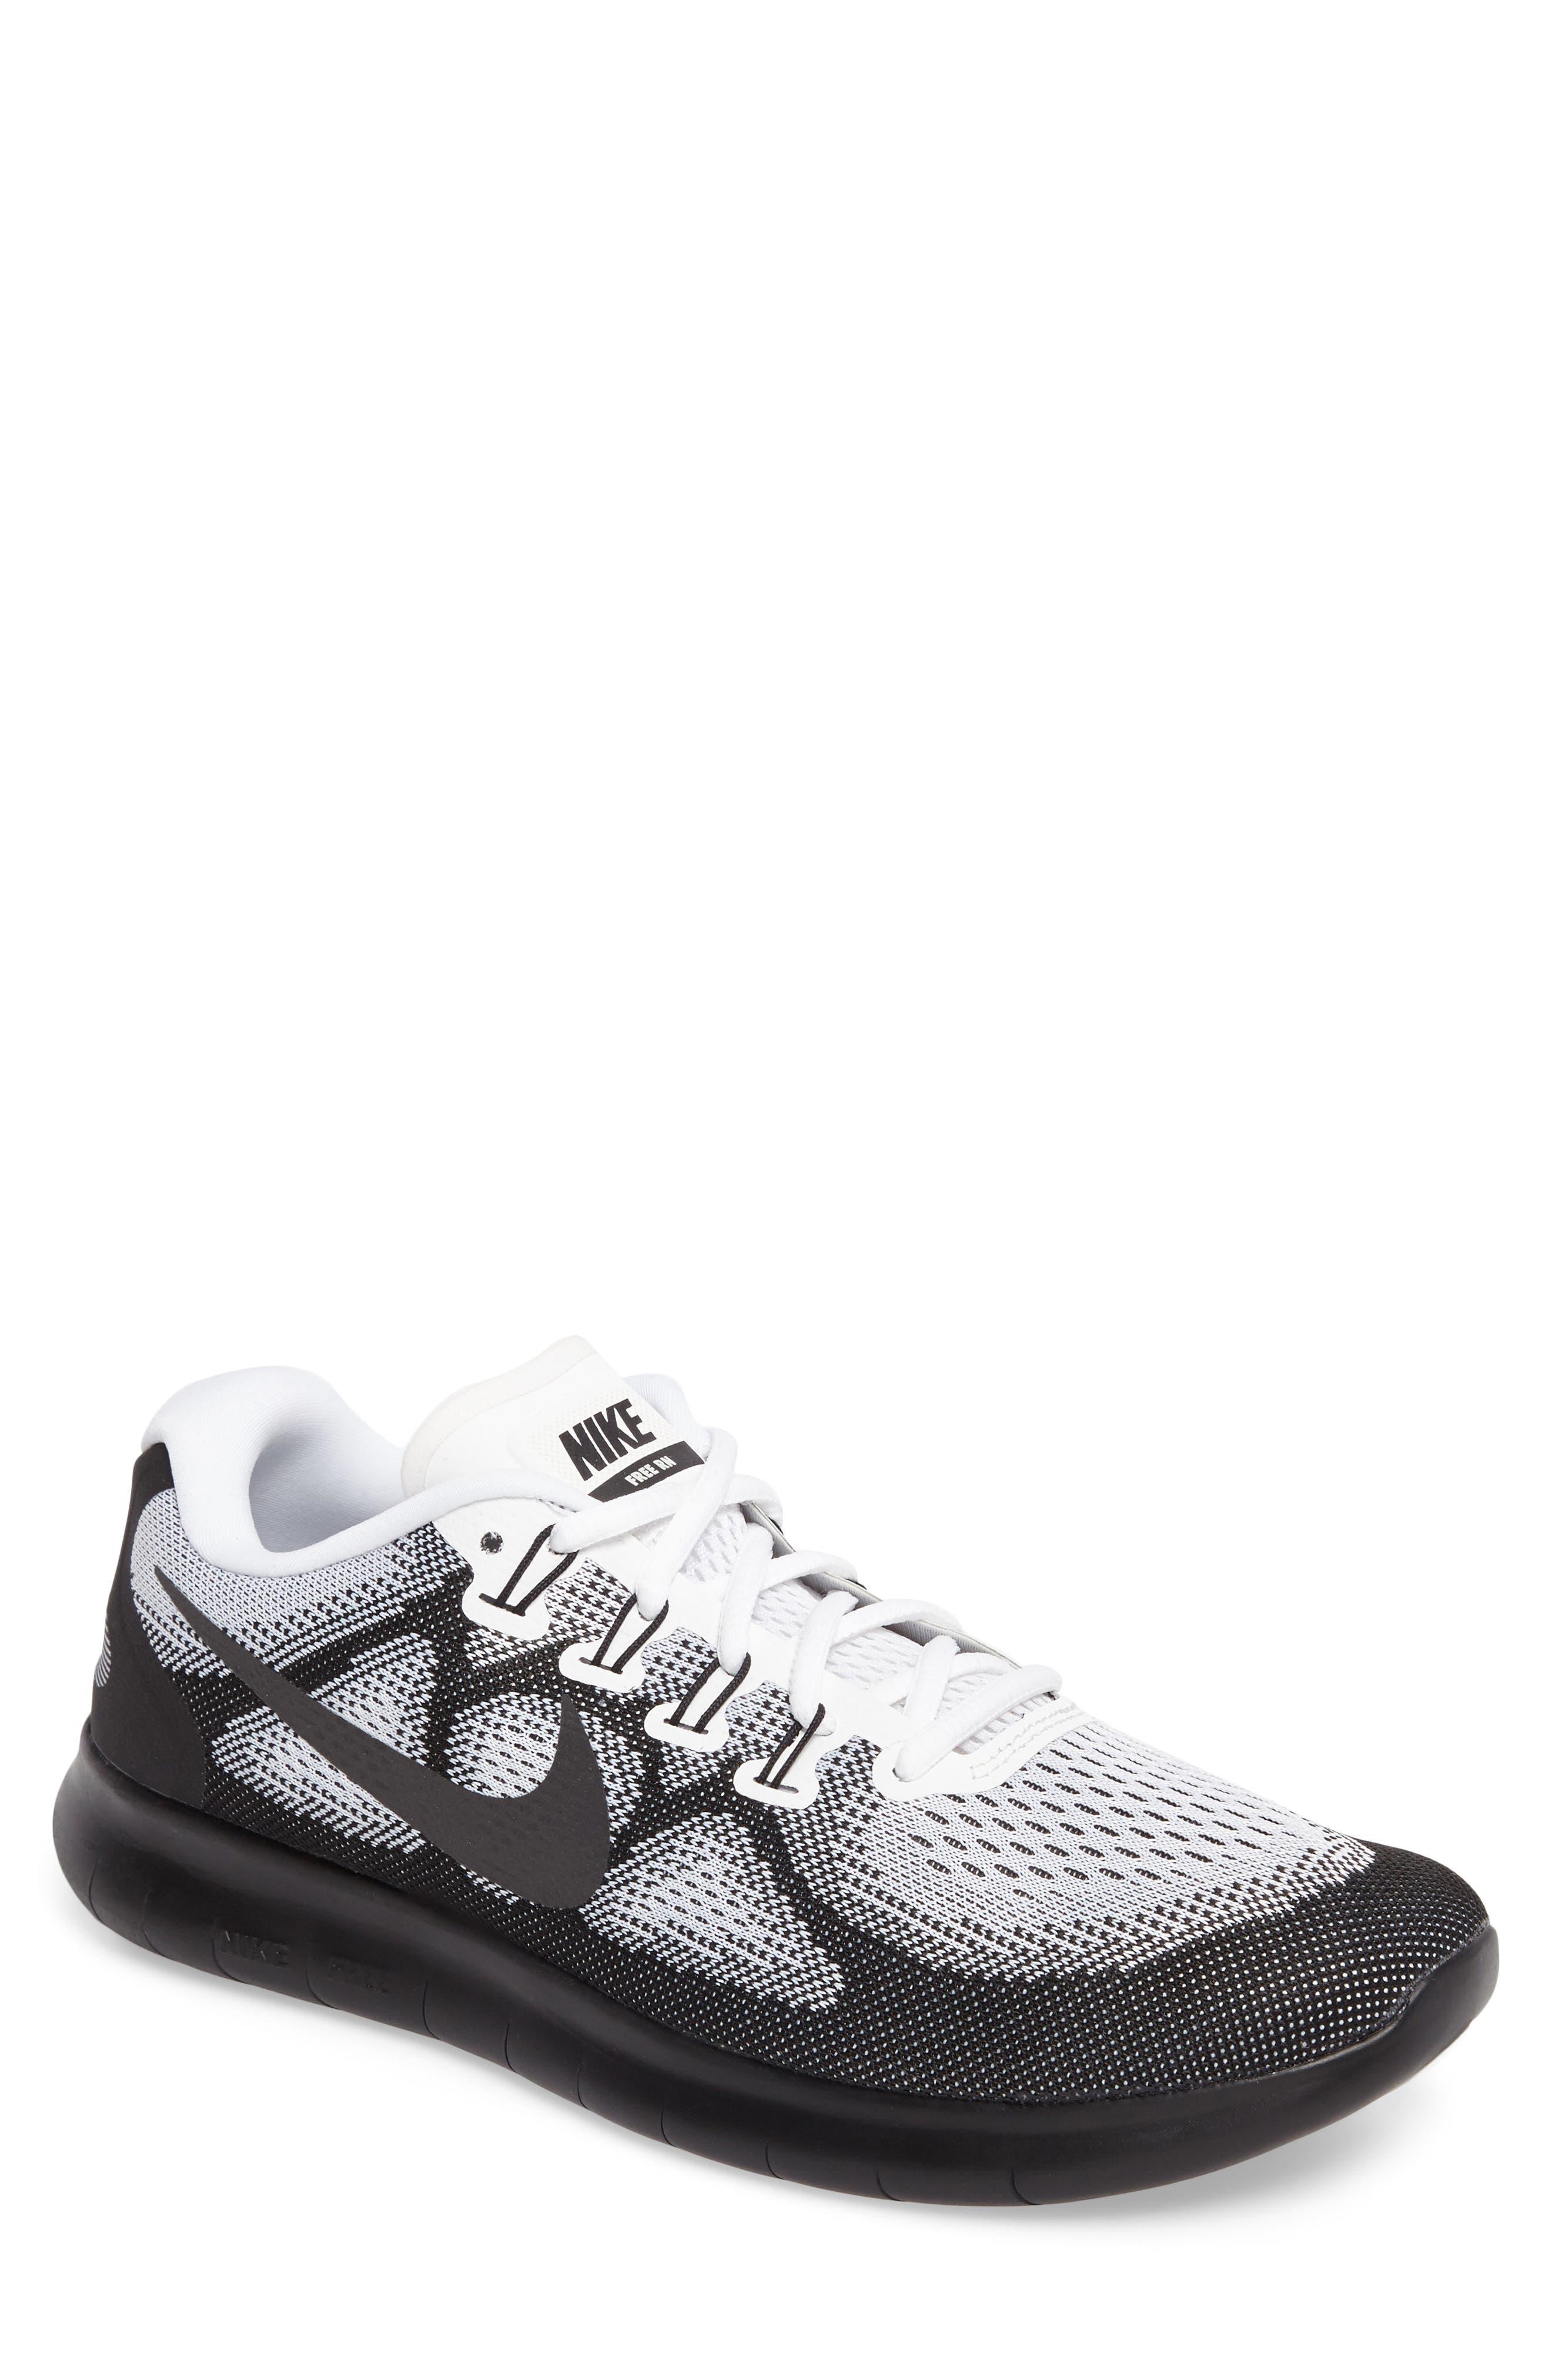 Free RN 2017 LE Running Shoe,                         Main,                         color, Black/Black/White